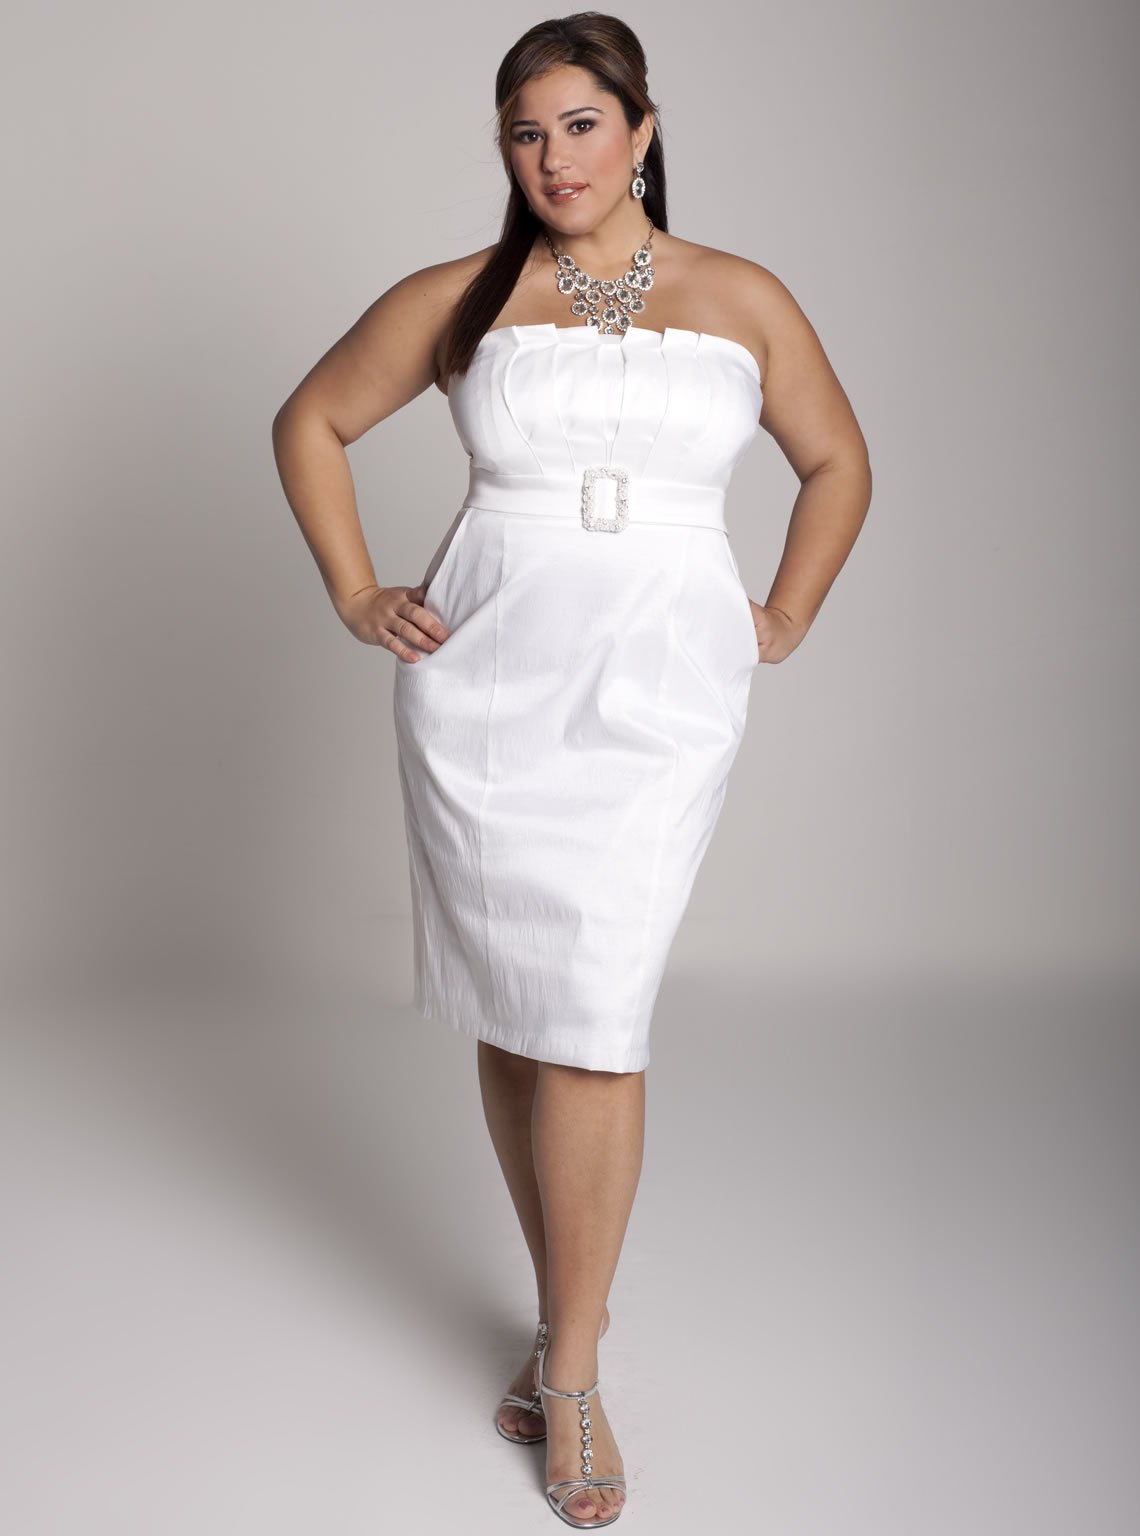 Plus Size Wedding Dresses For Older Brides Second Weddings | Saddha